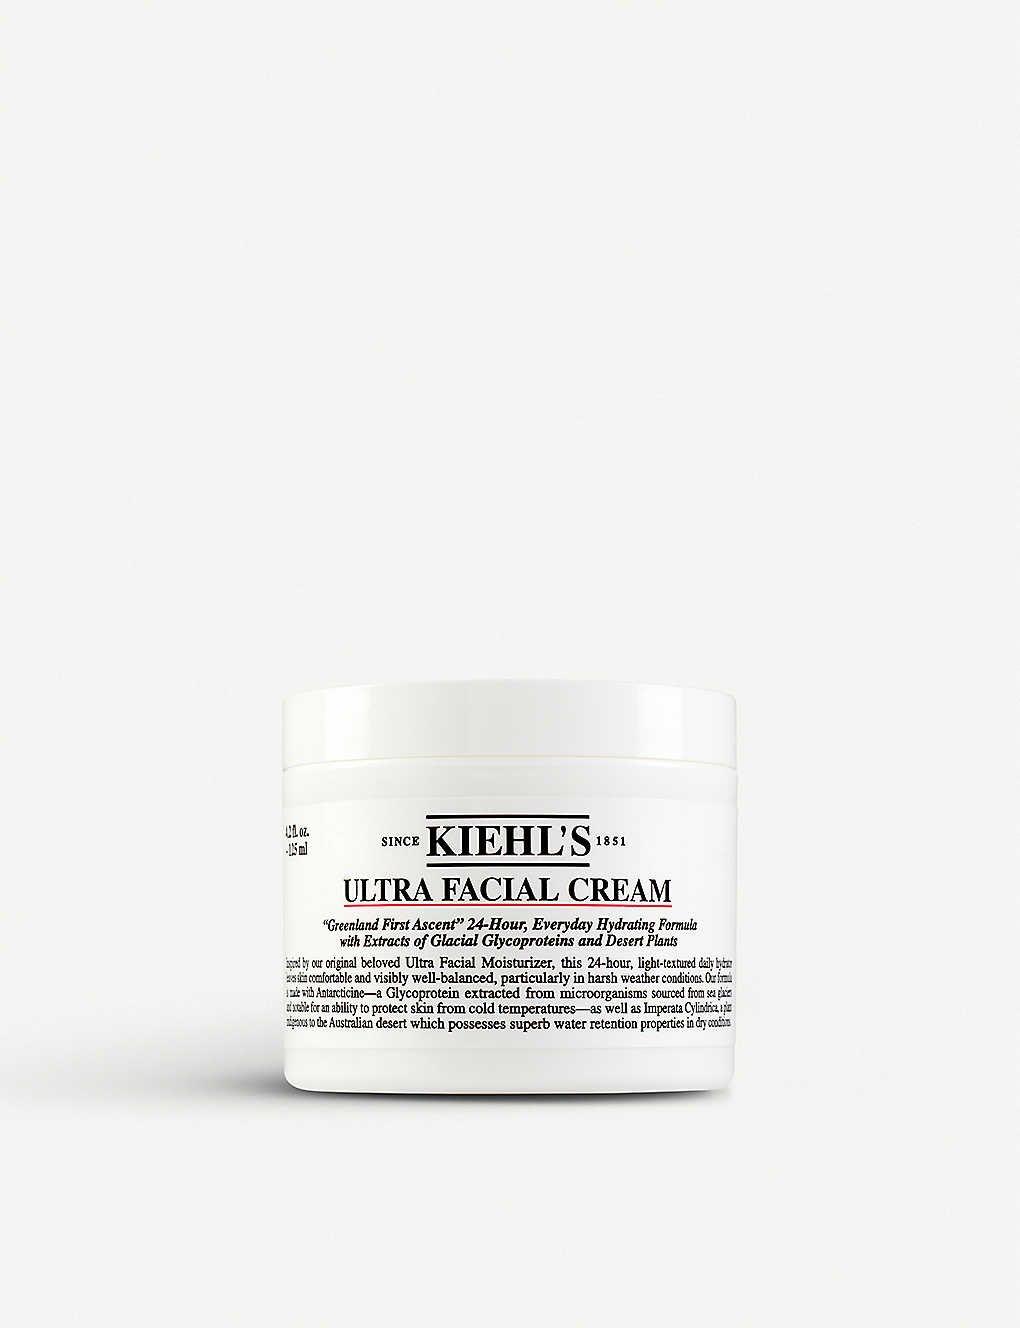 Kiehls 契爾氏 冰河醣蛋白保濕霜 125ml Ultra Facial Cream moisturiser